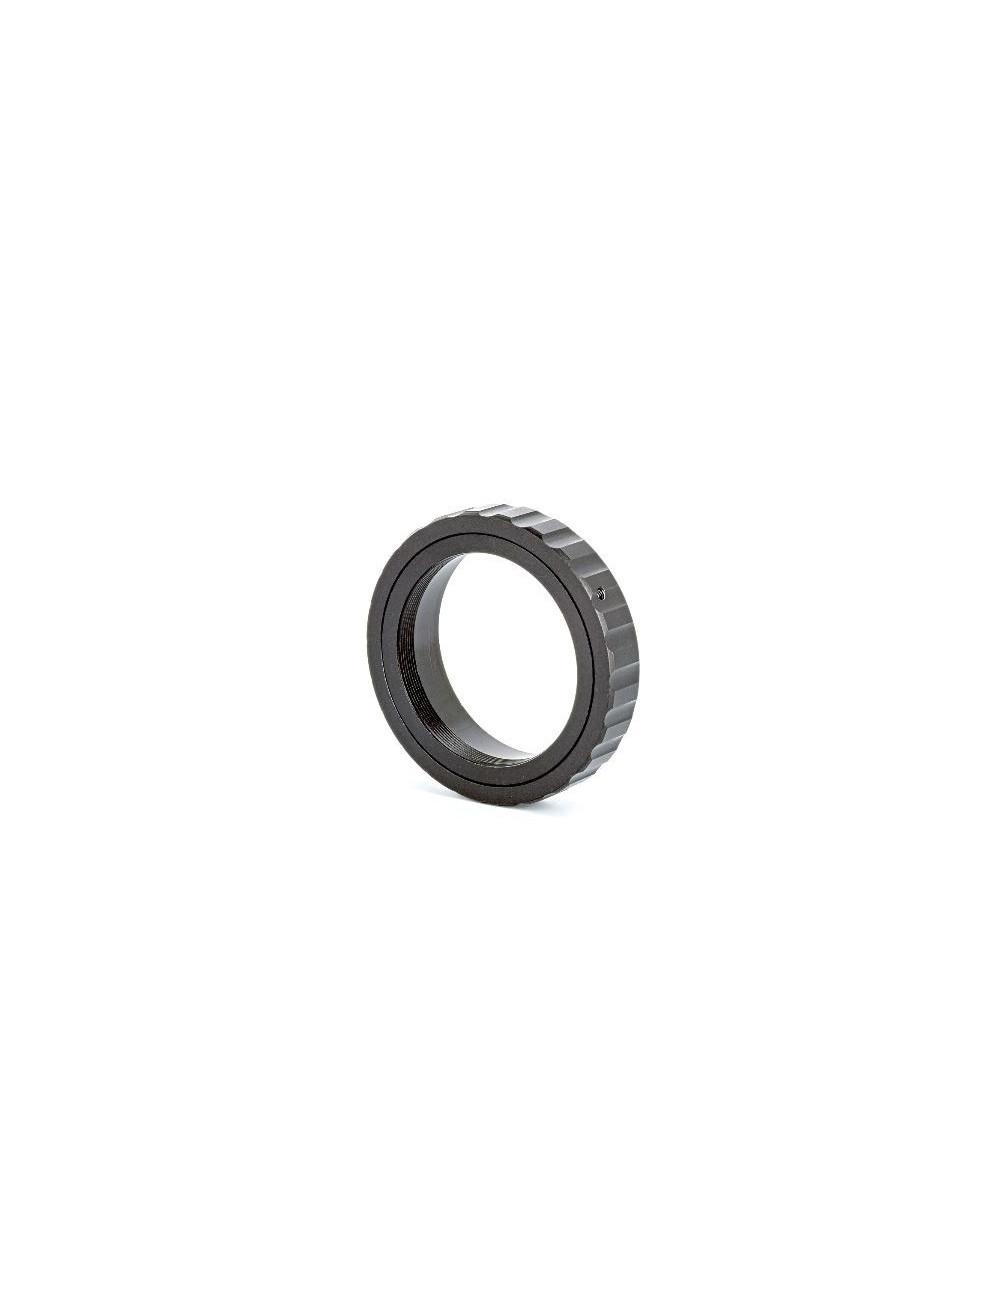 Bague T monture Sony/Konica/Minolta AF